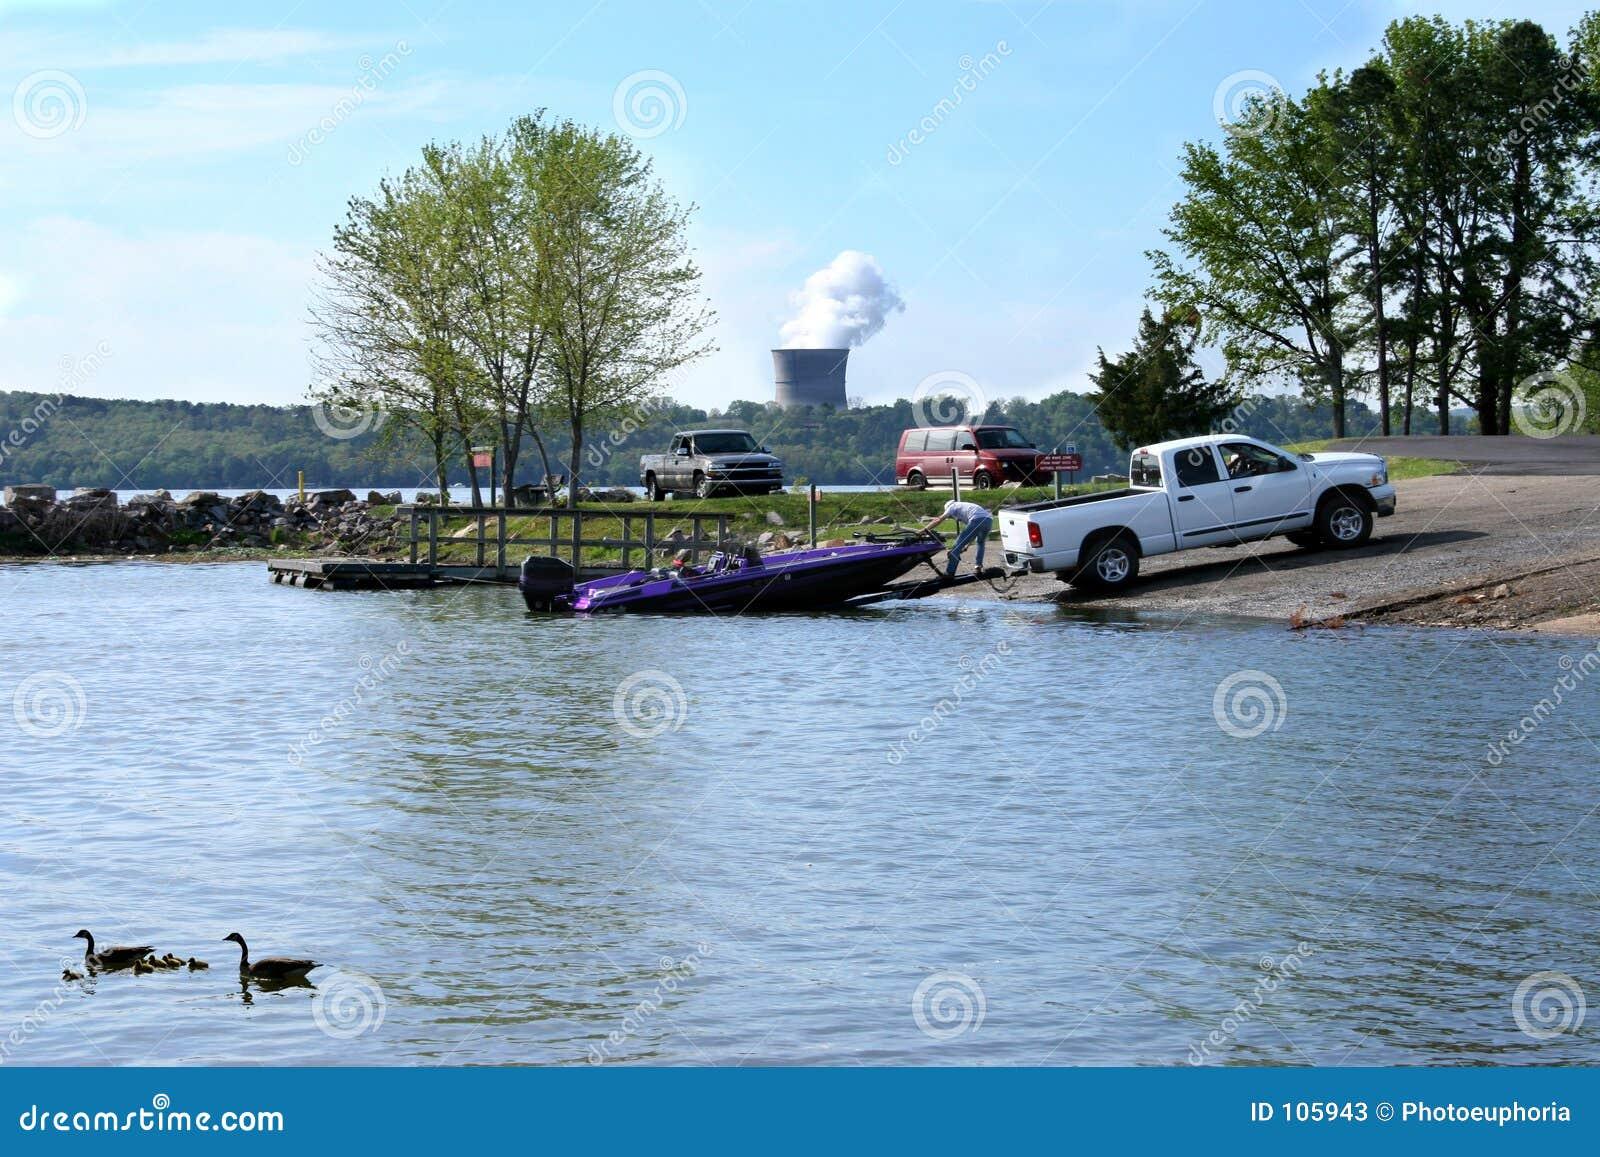 Desporto de barco no parque